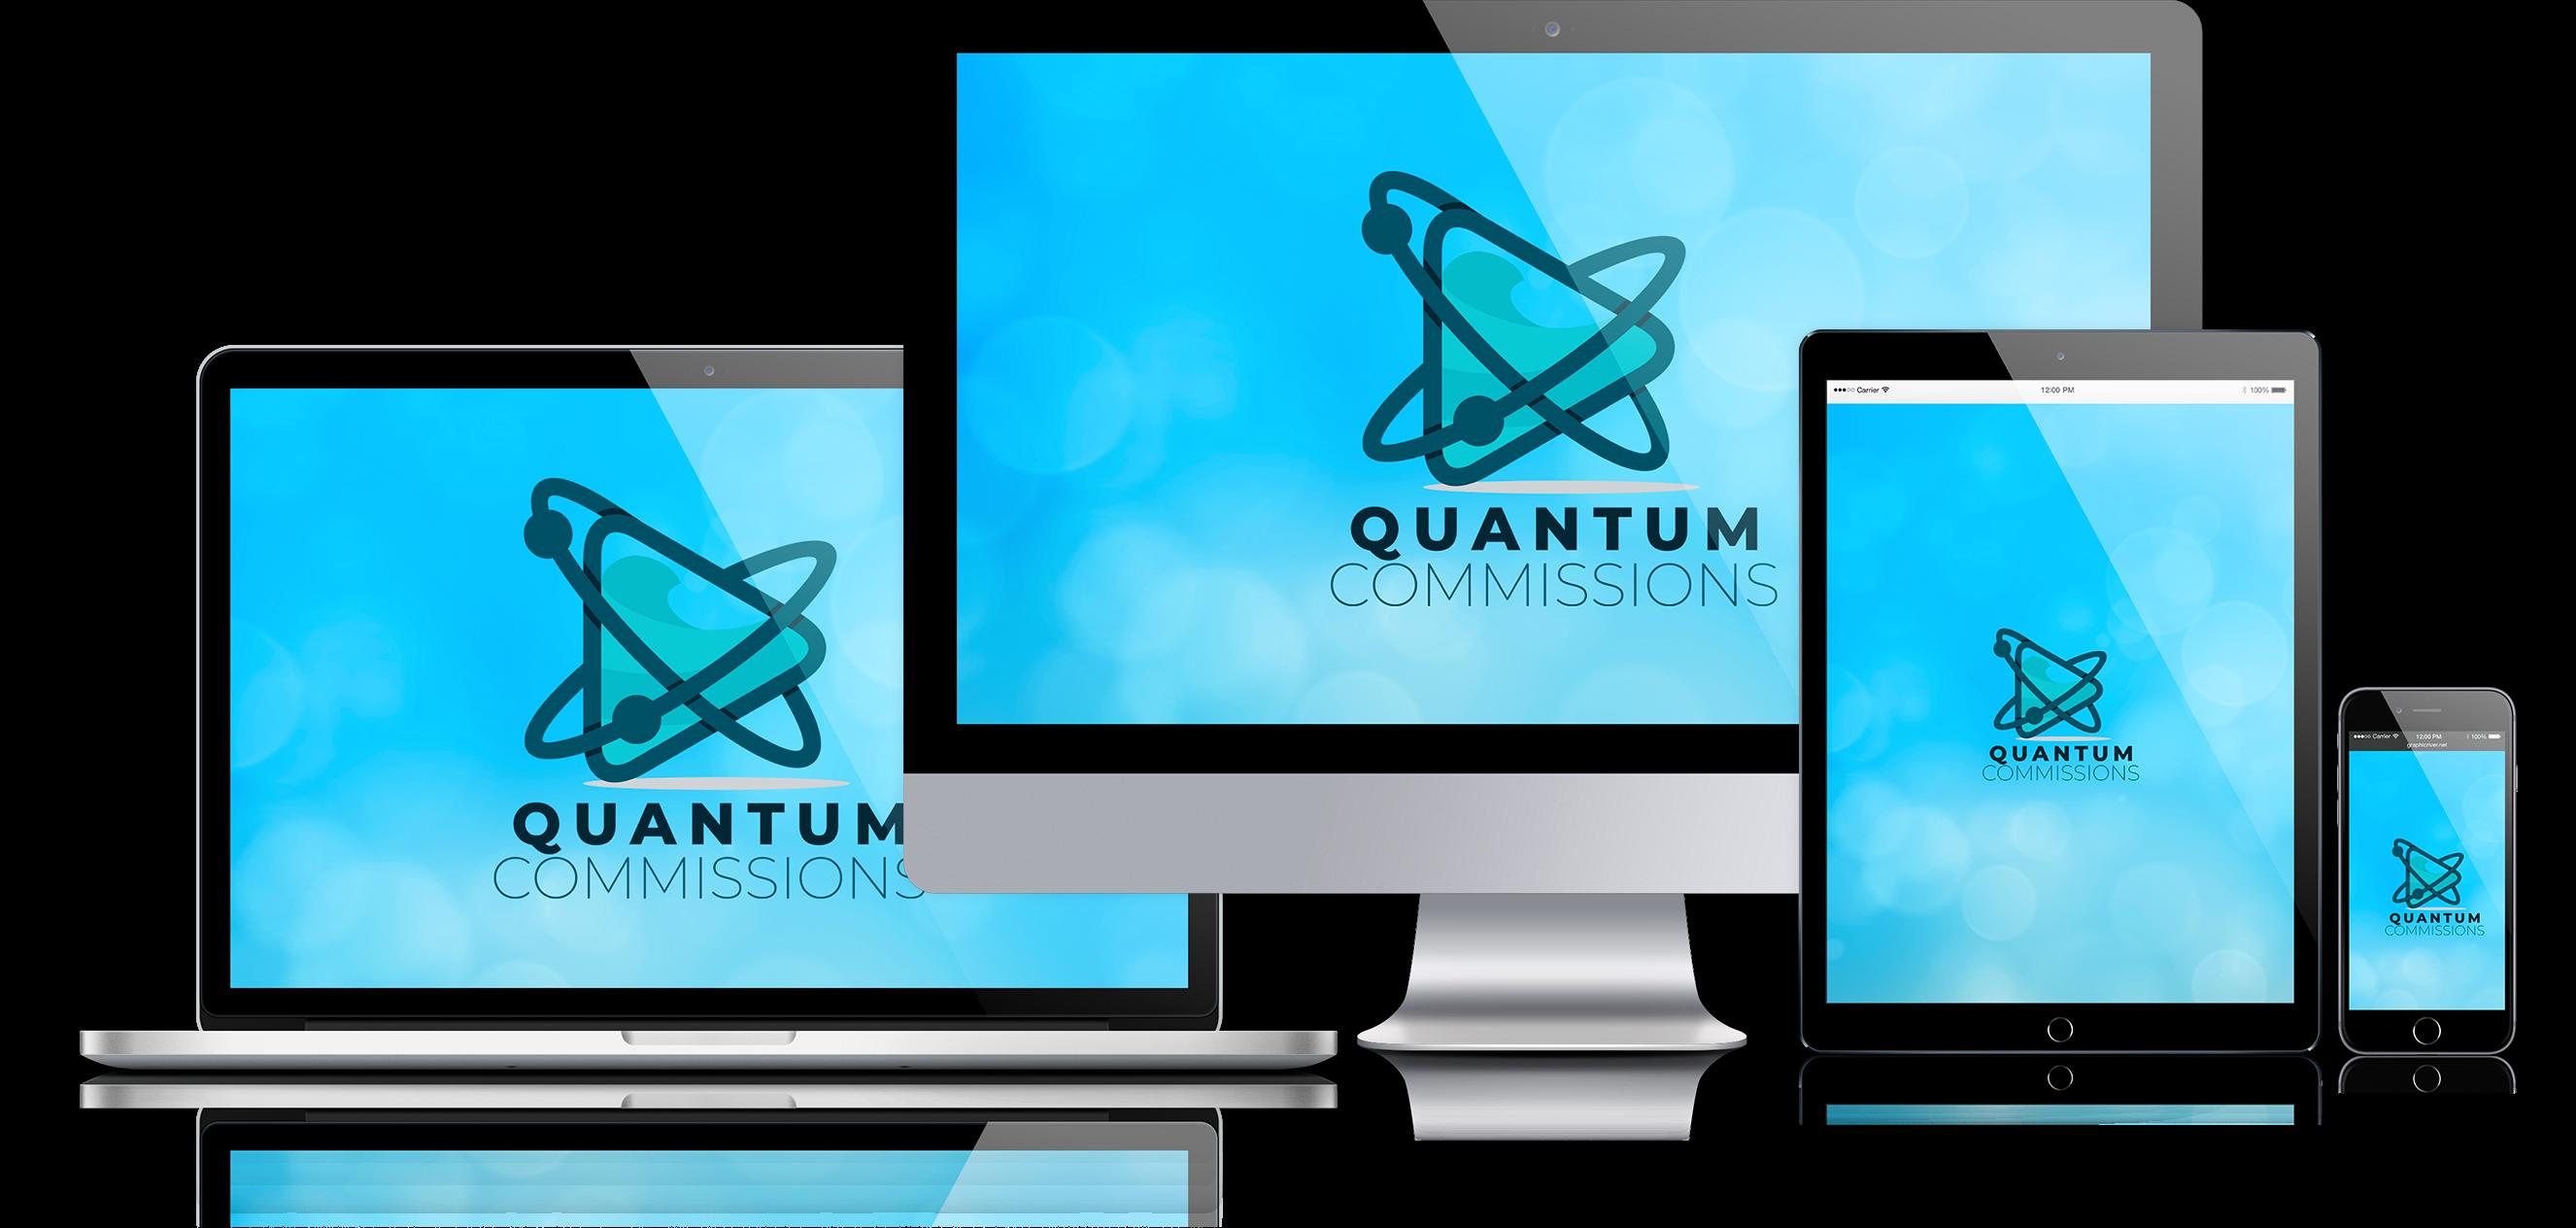 JayKay Dowdall - Quantum Commissions Download